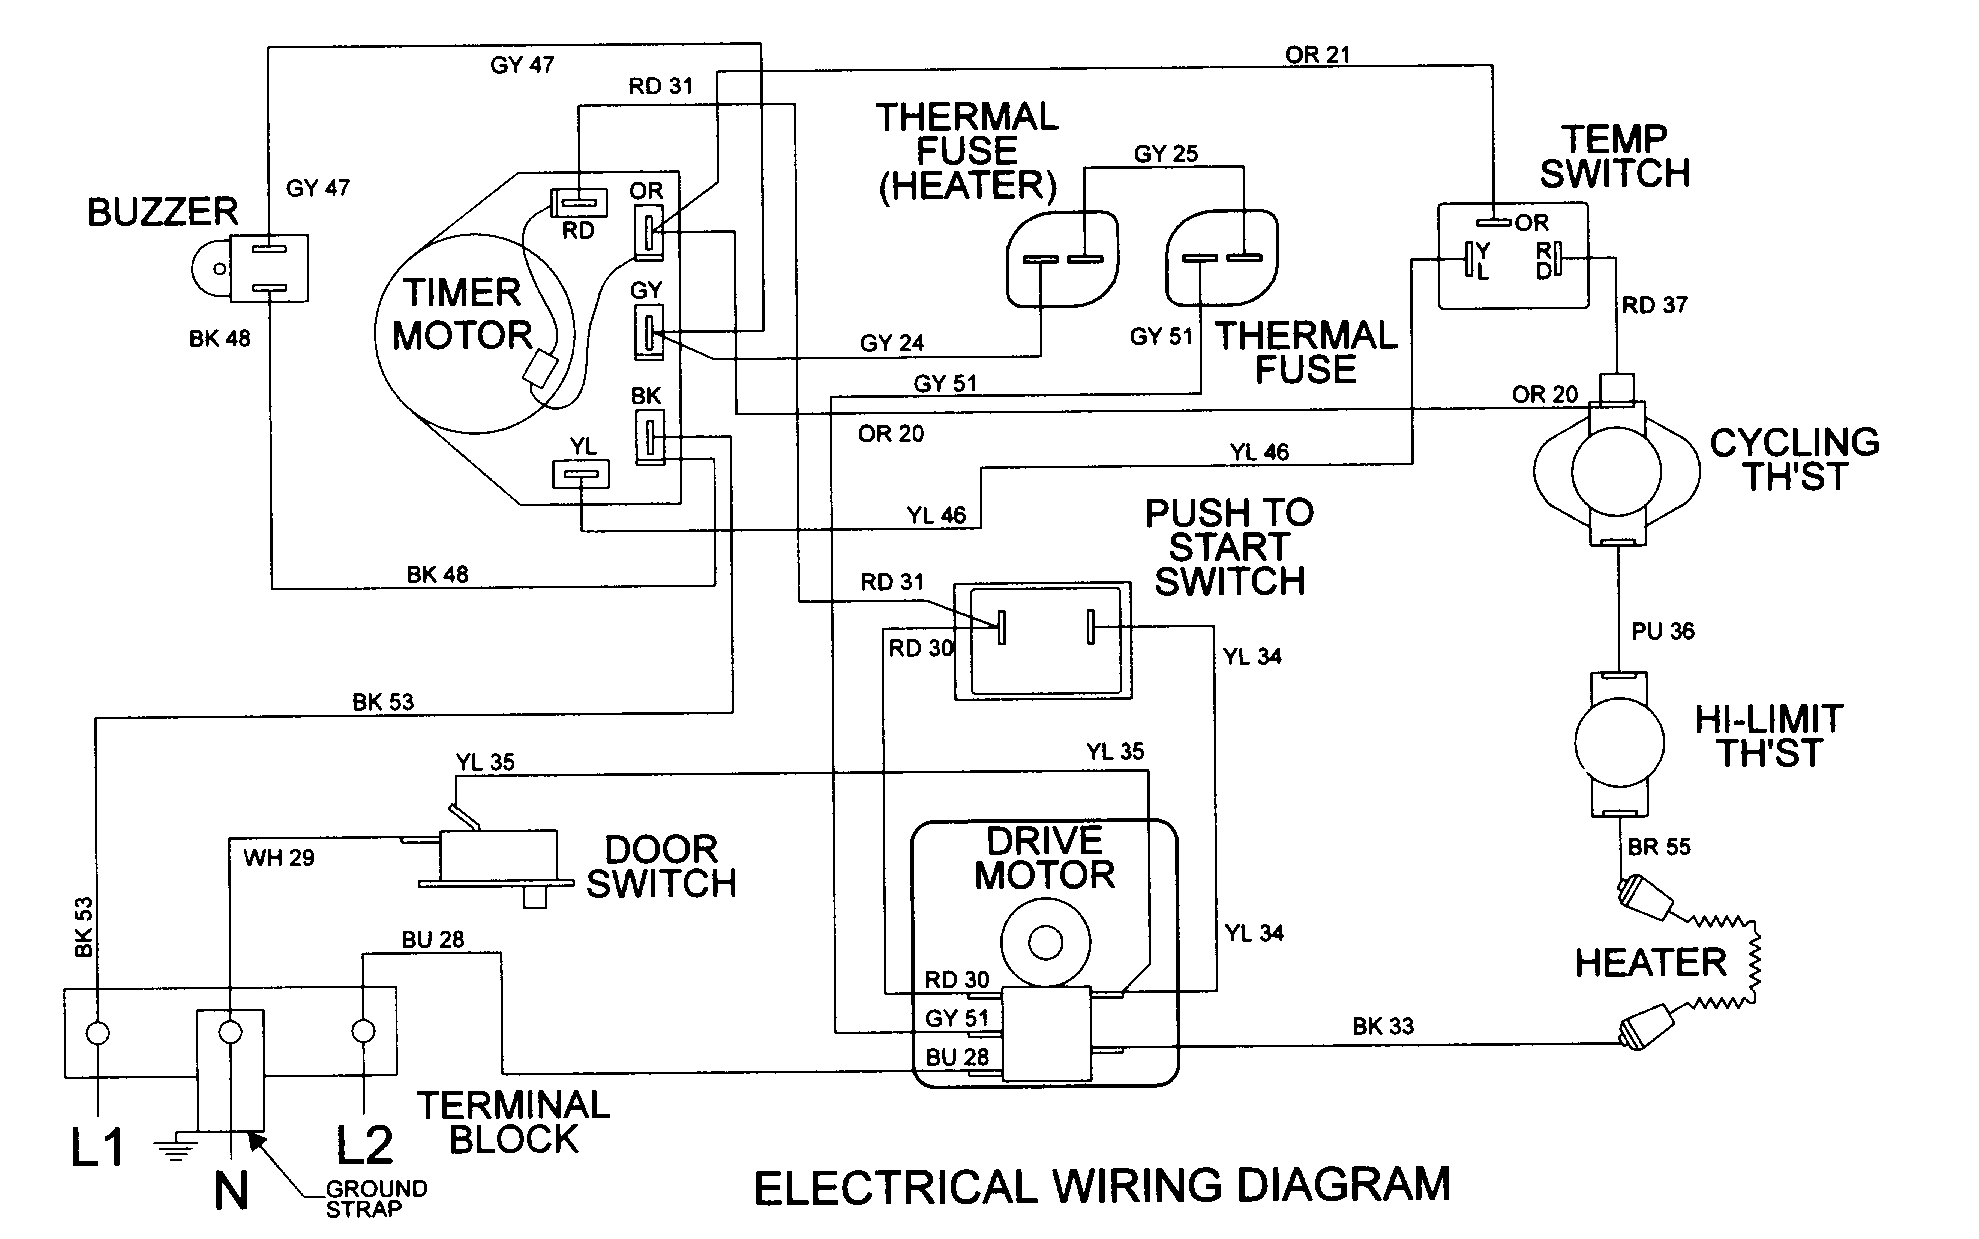 Maytag Atlantis Electric Dryer Wiring Diagram